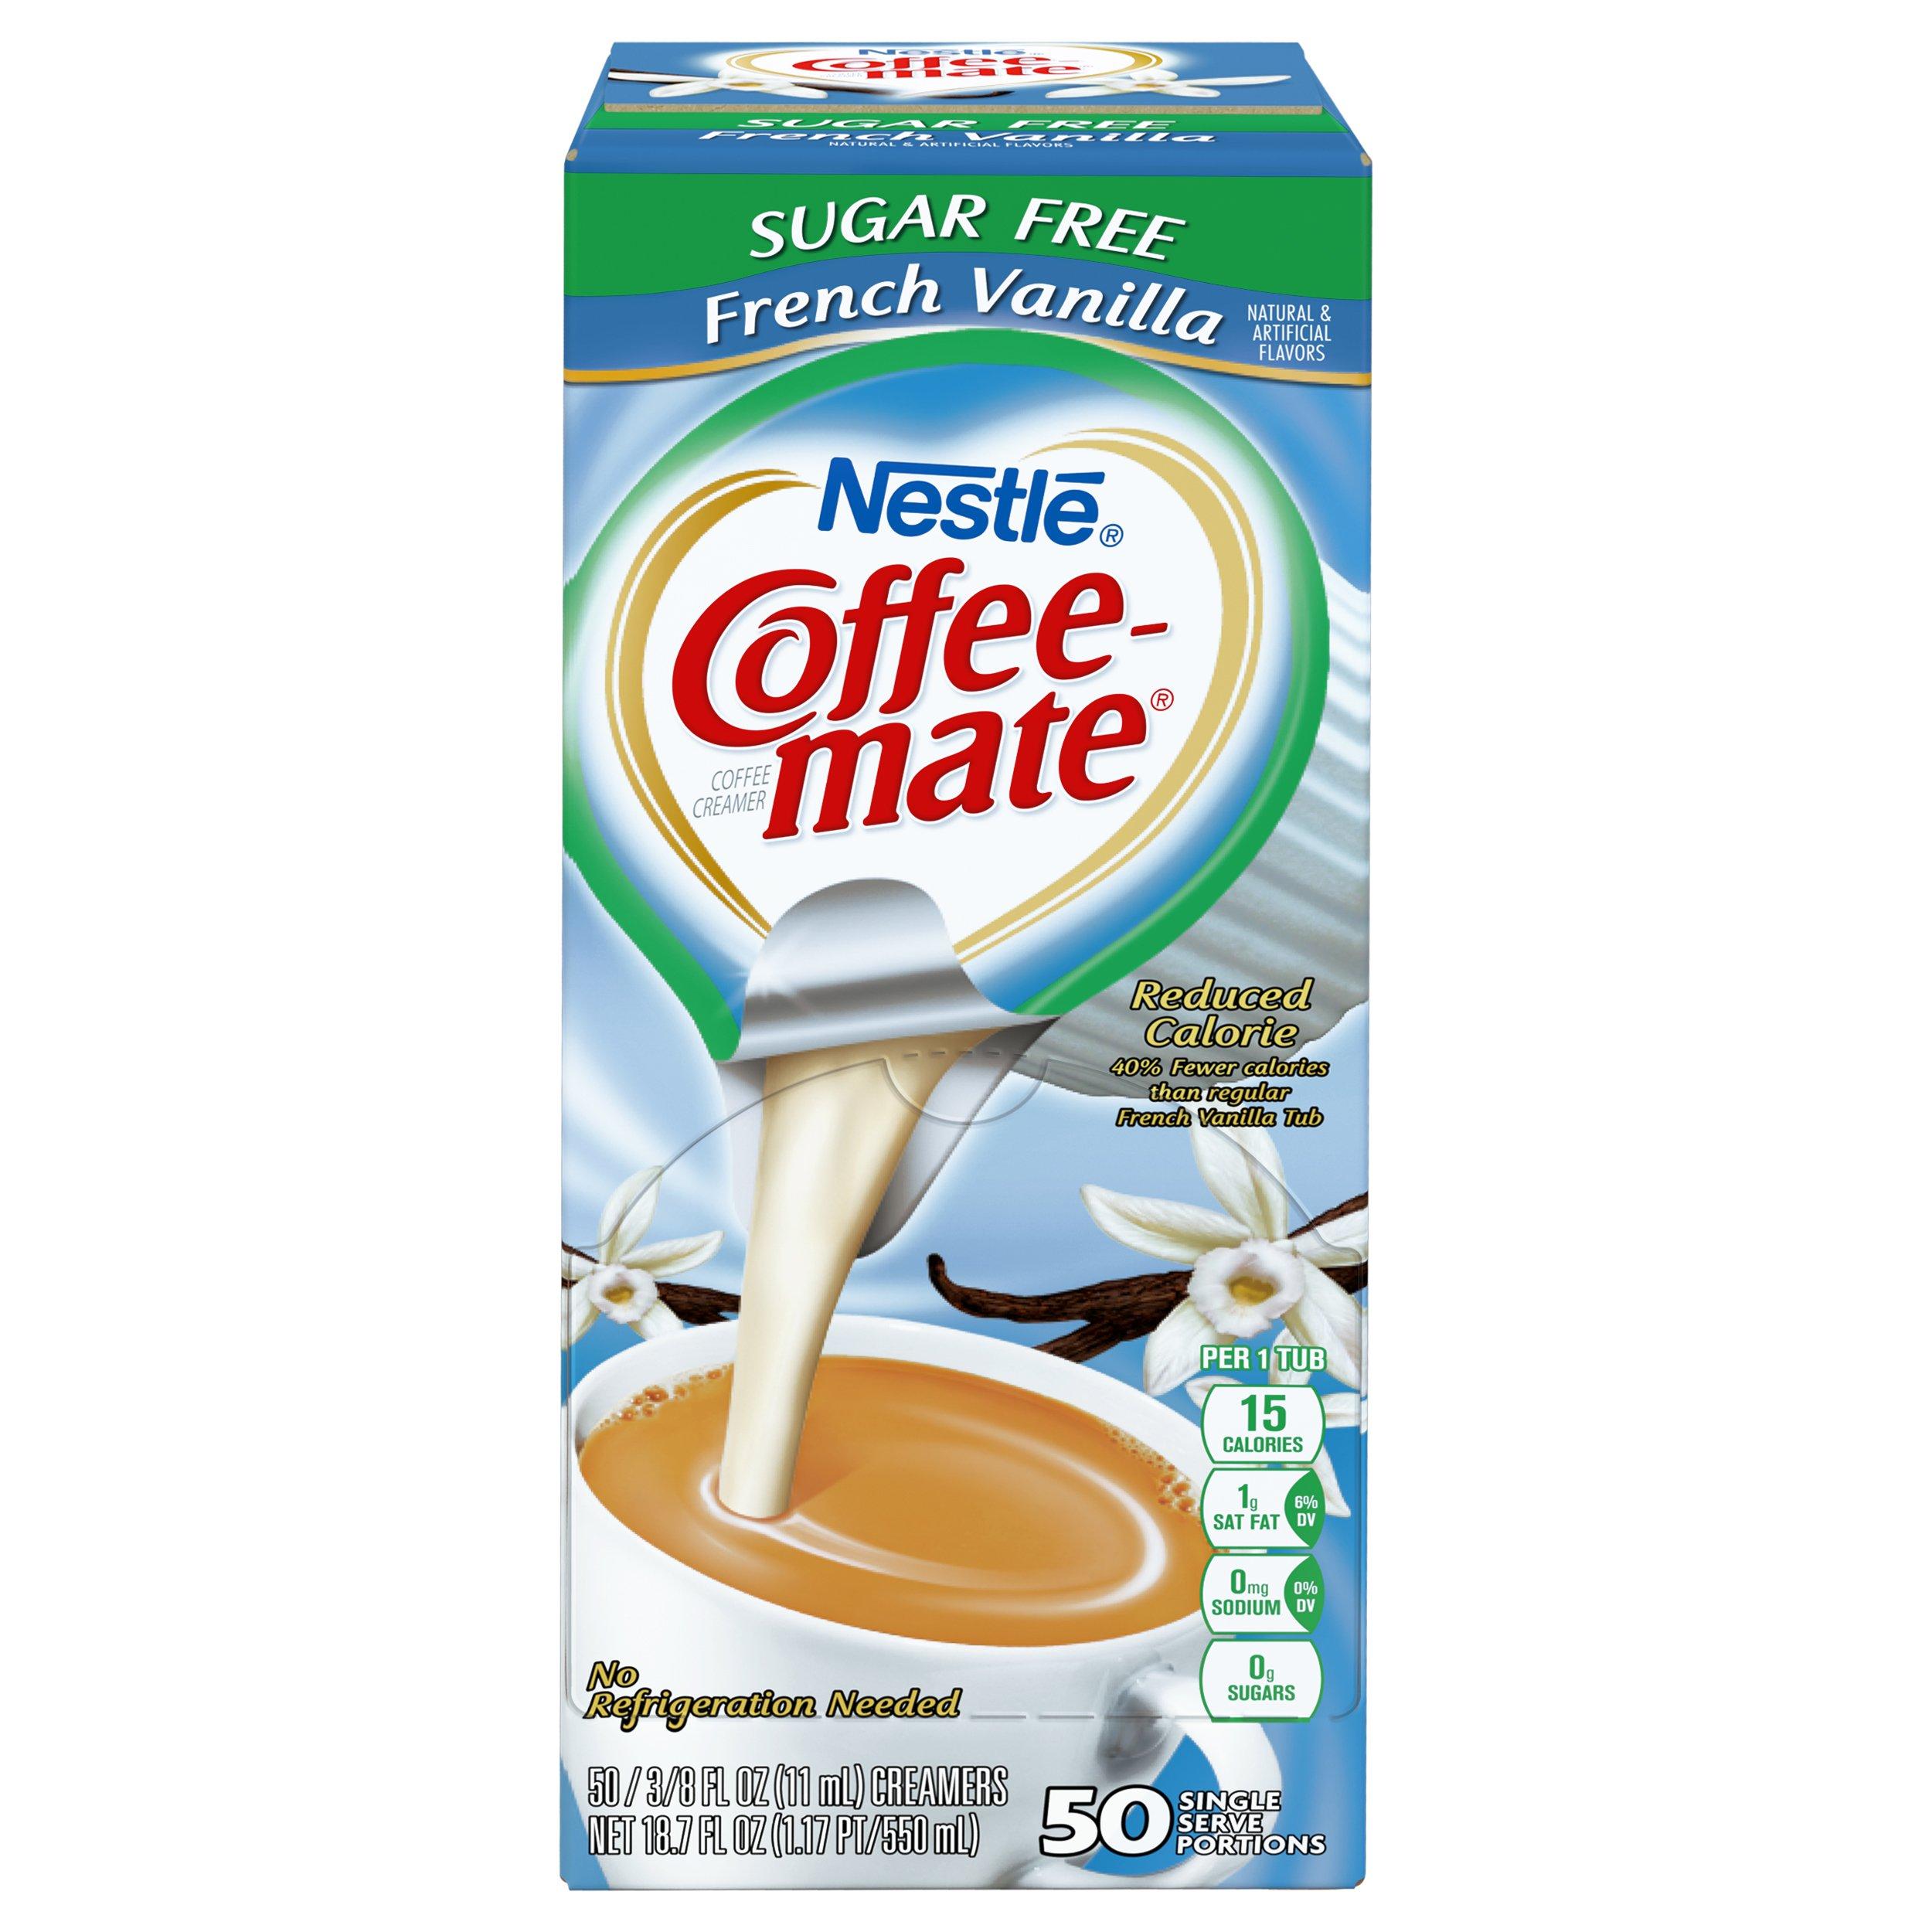 NESTLE COFFEE-MATE Coffee Creamer, Sugar Free French Vanilla, liquid creamer singles, Pack of 50 by Nestle Coffee Mate (Image #2)